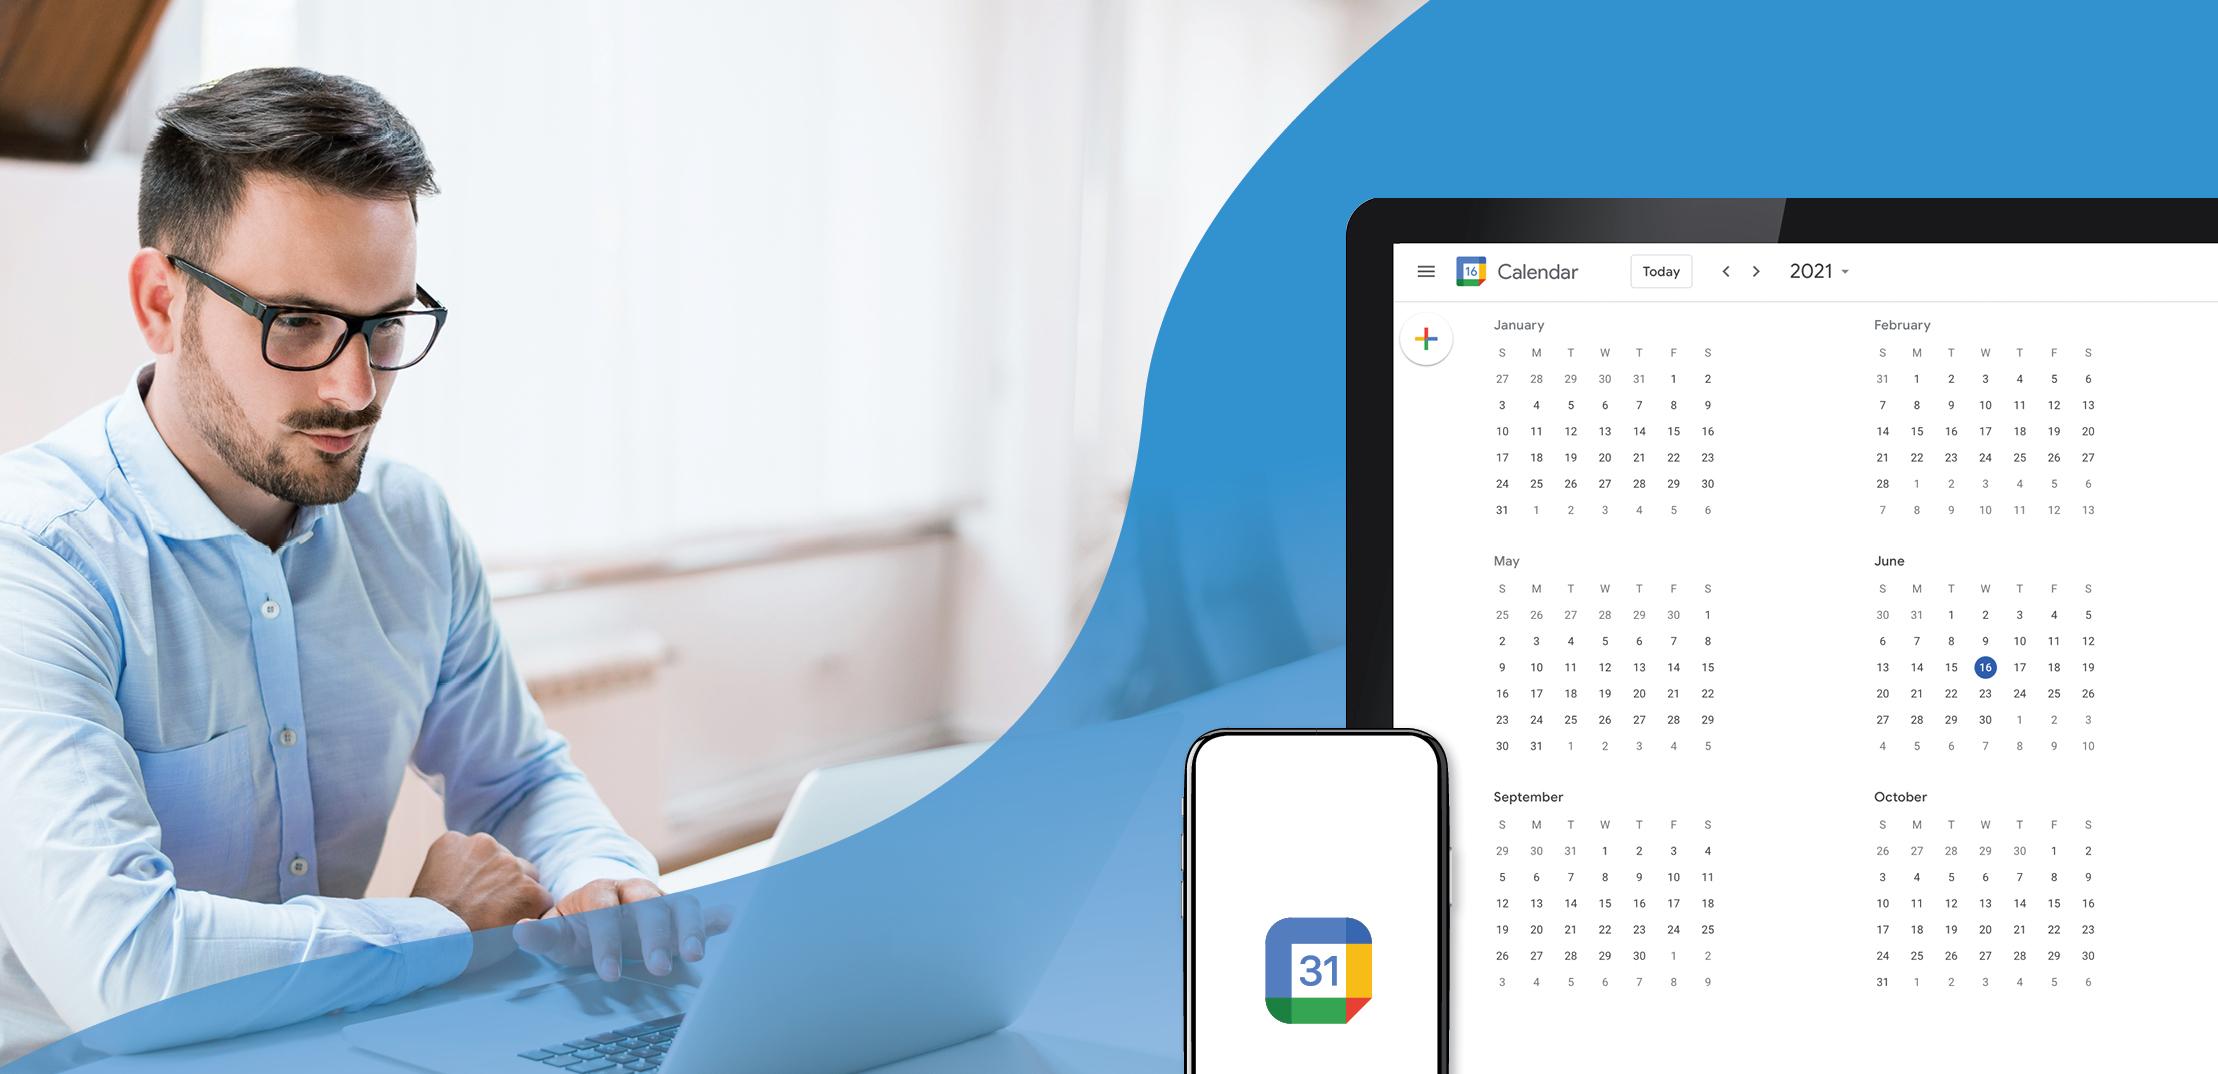 using the Google Calendar app